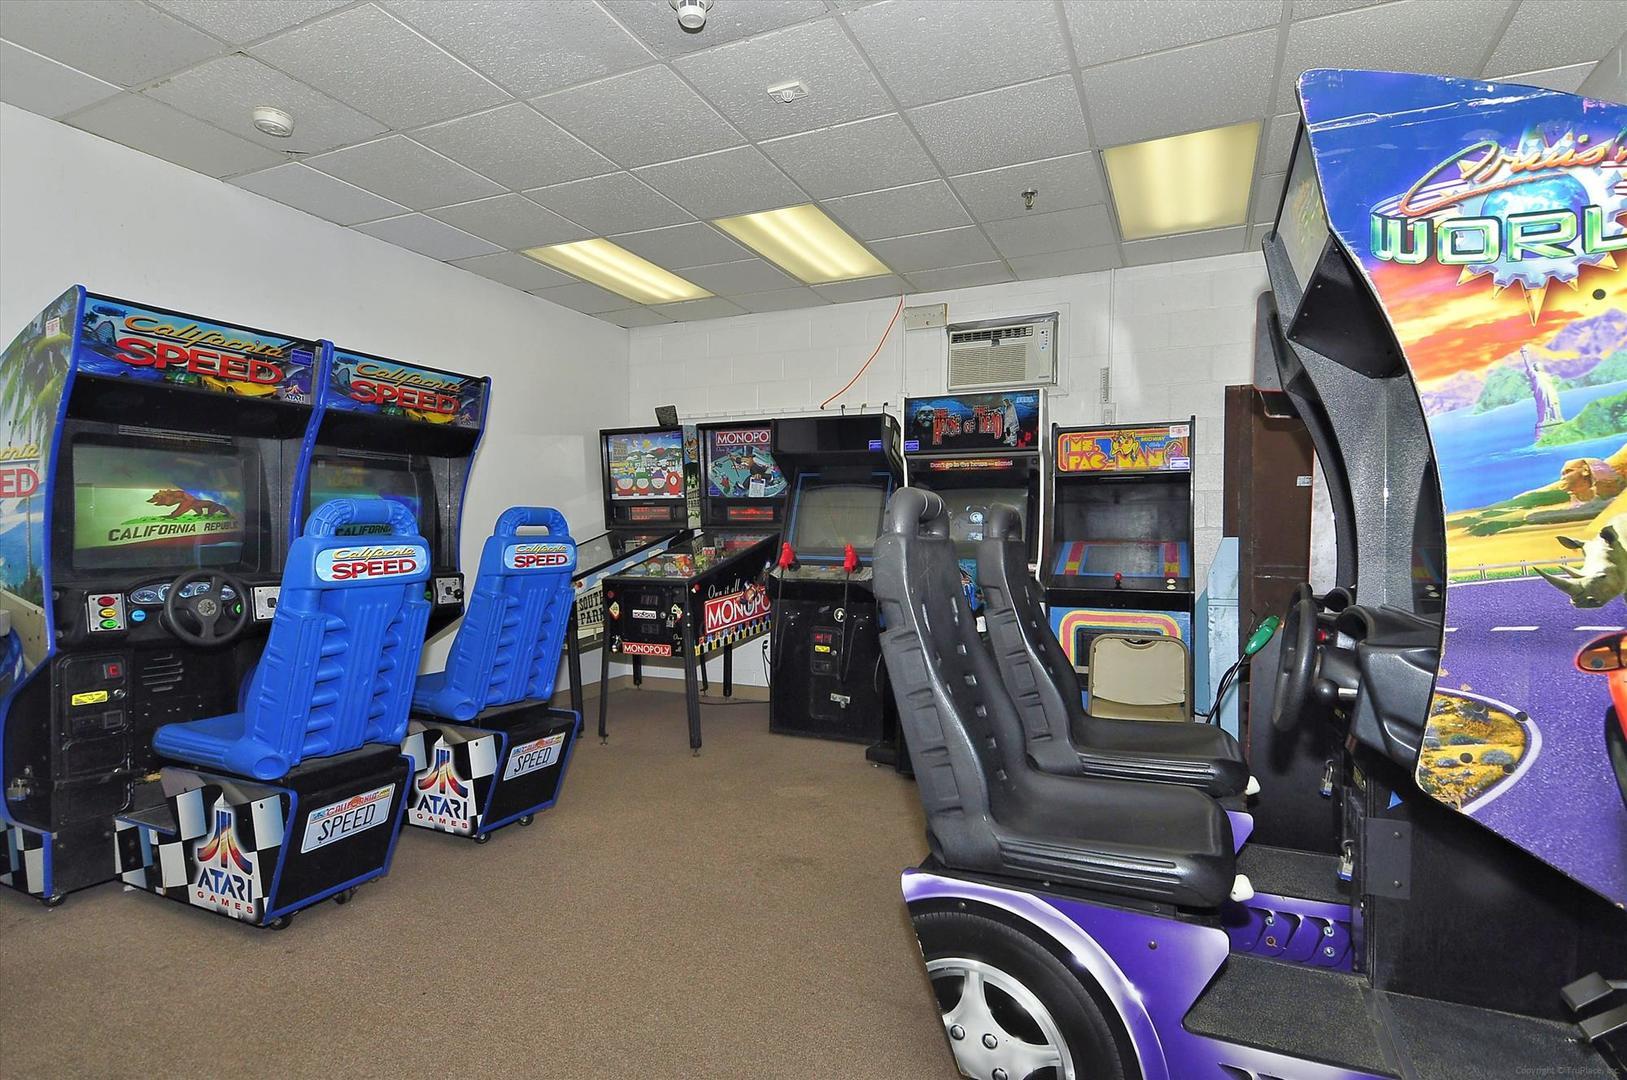 English Towers - Game Room